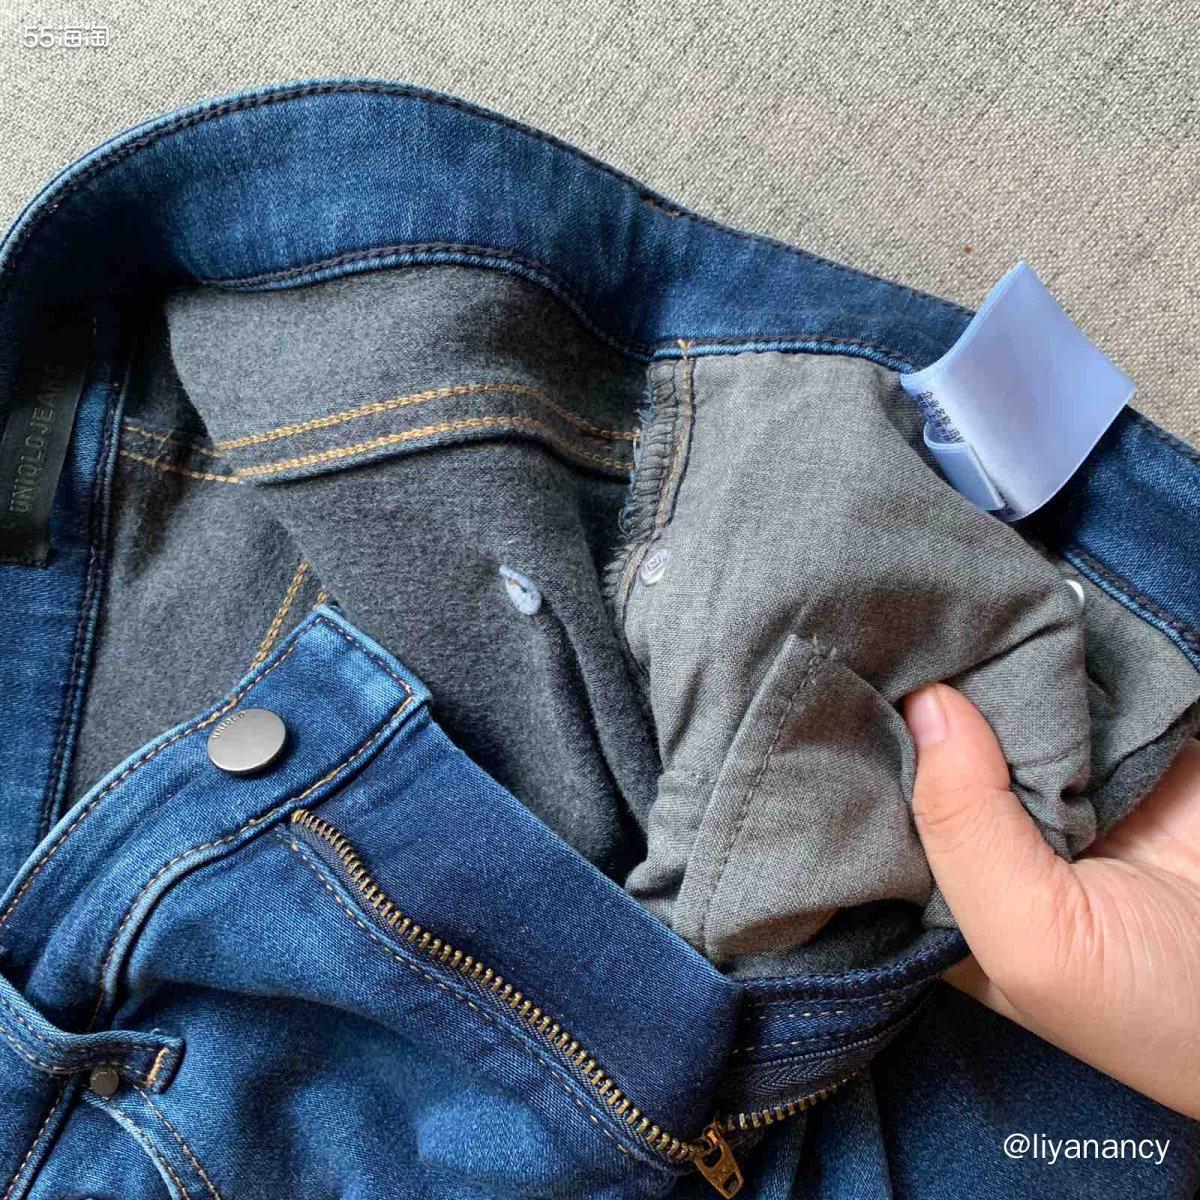 heattech牛仔裤  ✨这款是优衣库家的heattech